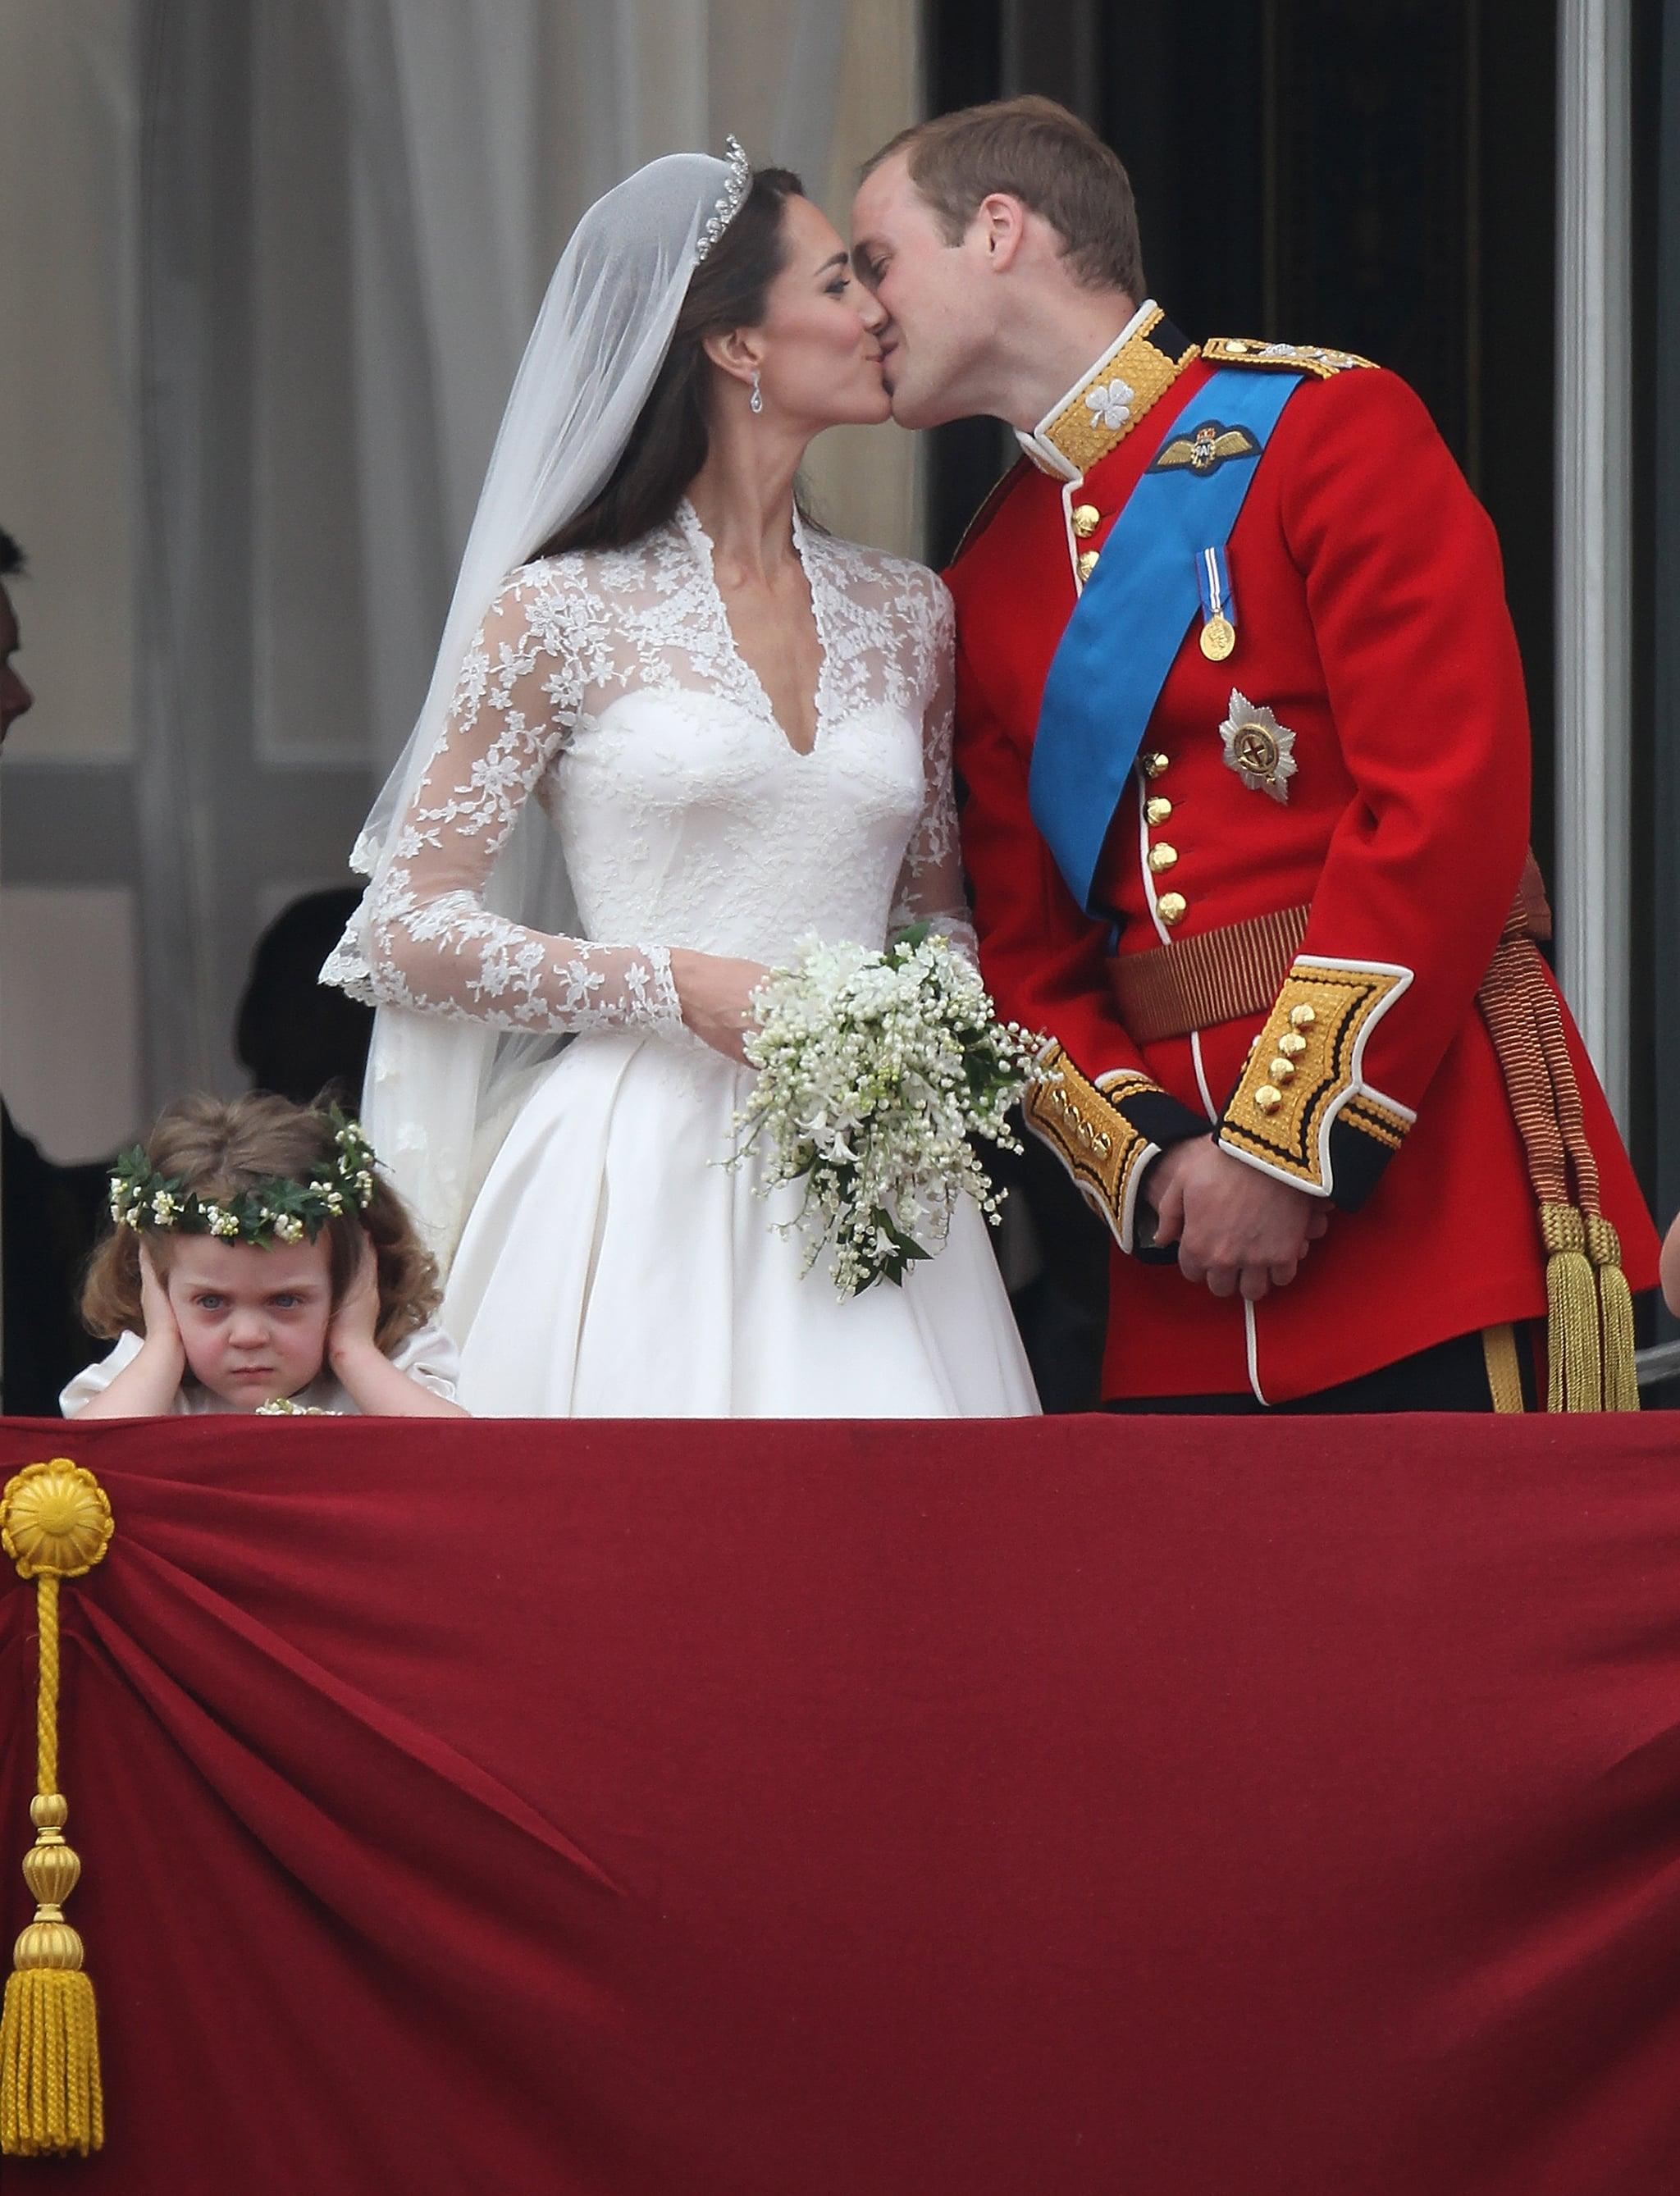 Royal Wedding Bridesmaid Dresses 84 Unique Share This Link